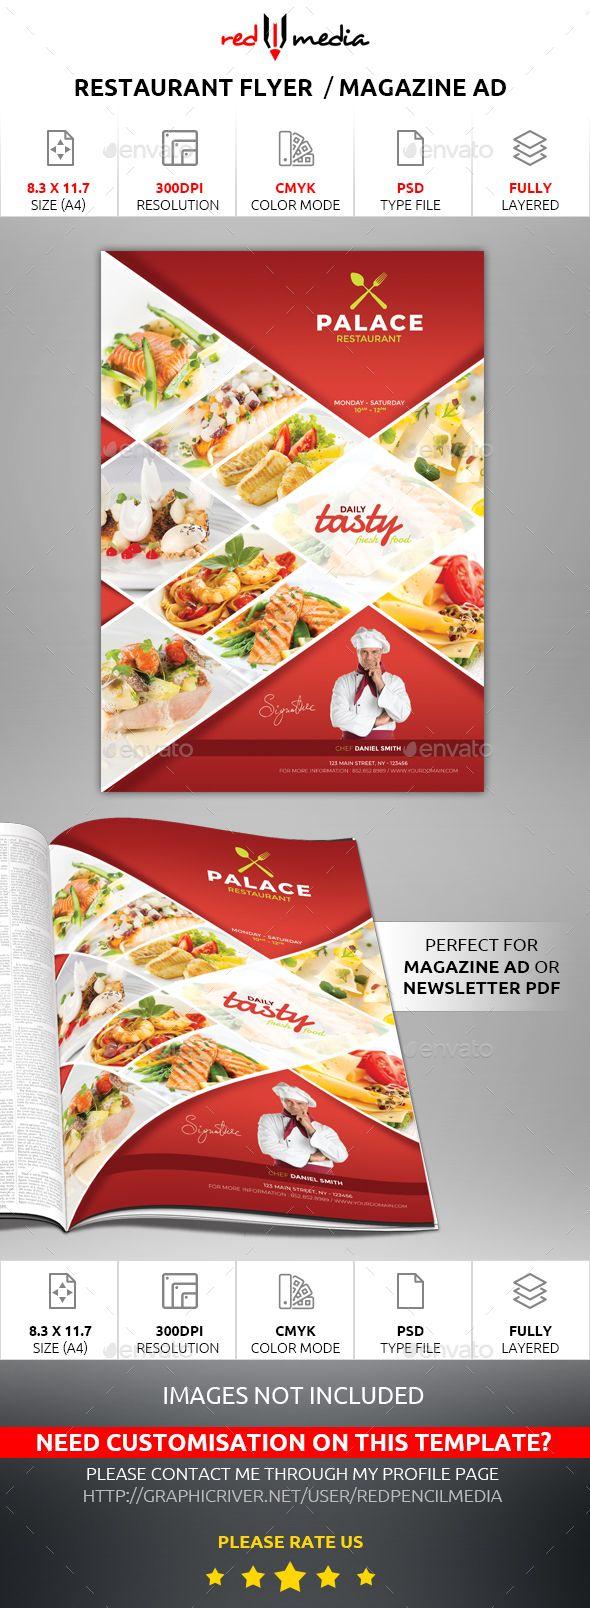 Restaurant Flyer  Magazine Ad  Magazine Ads Ads And Magazines